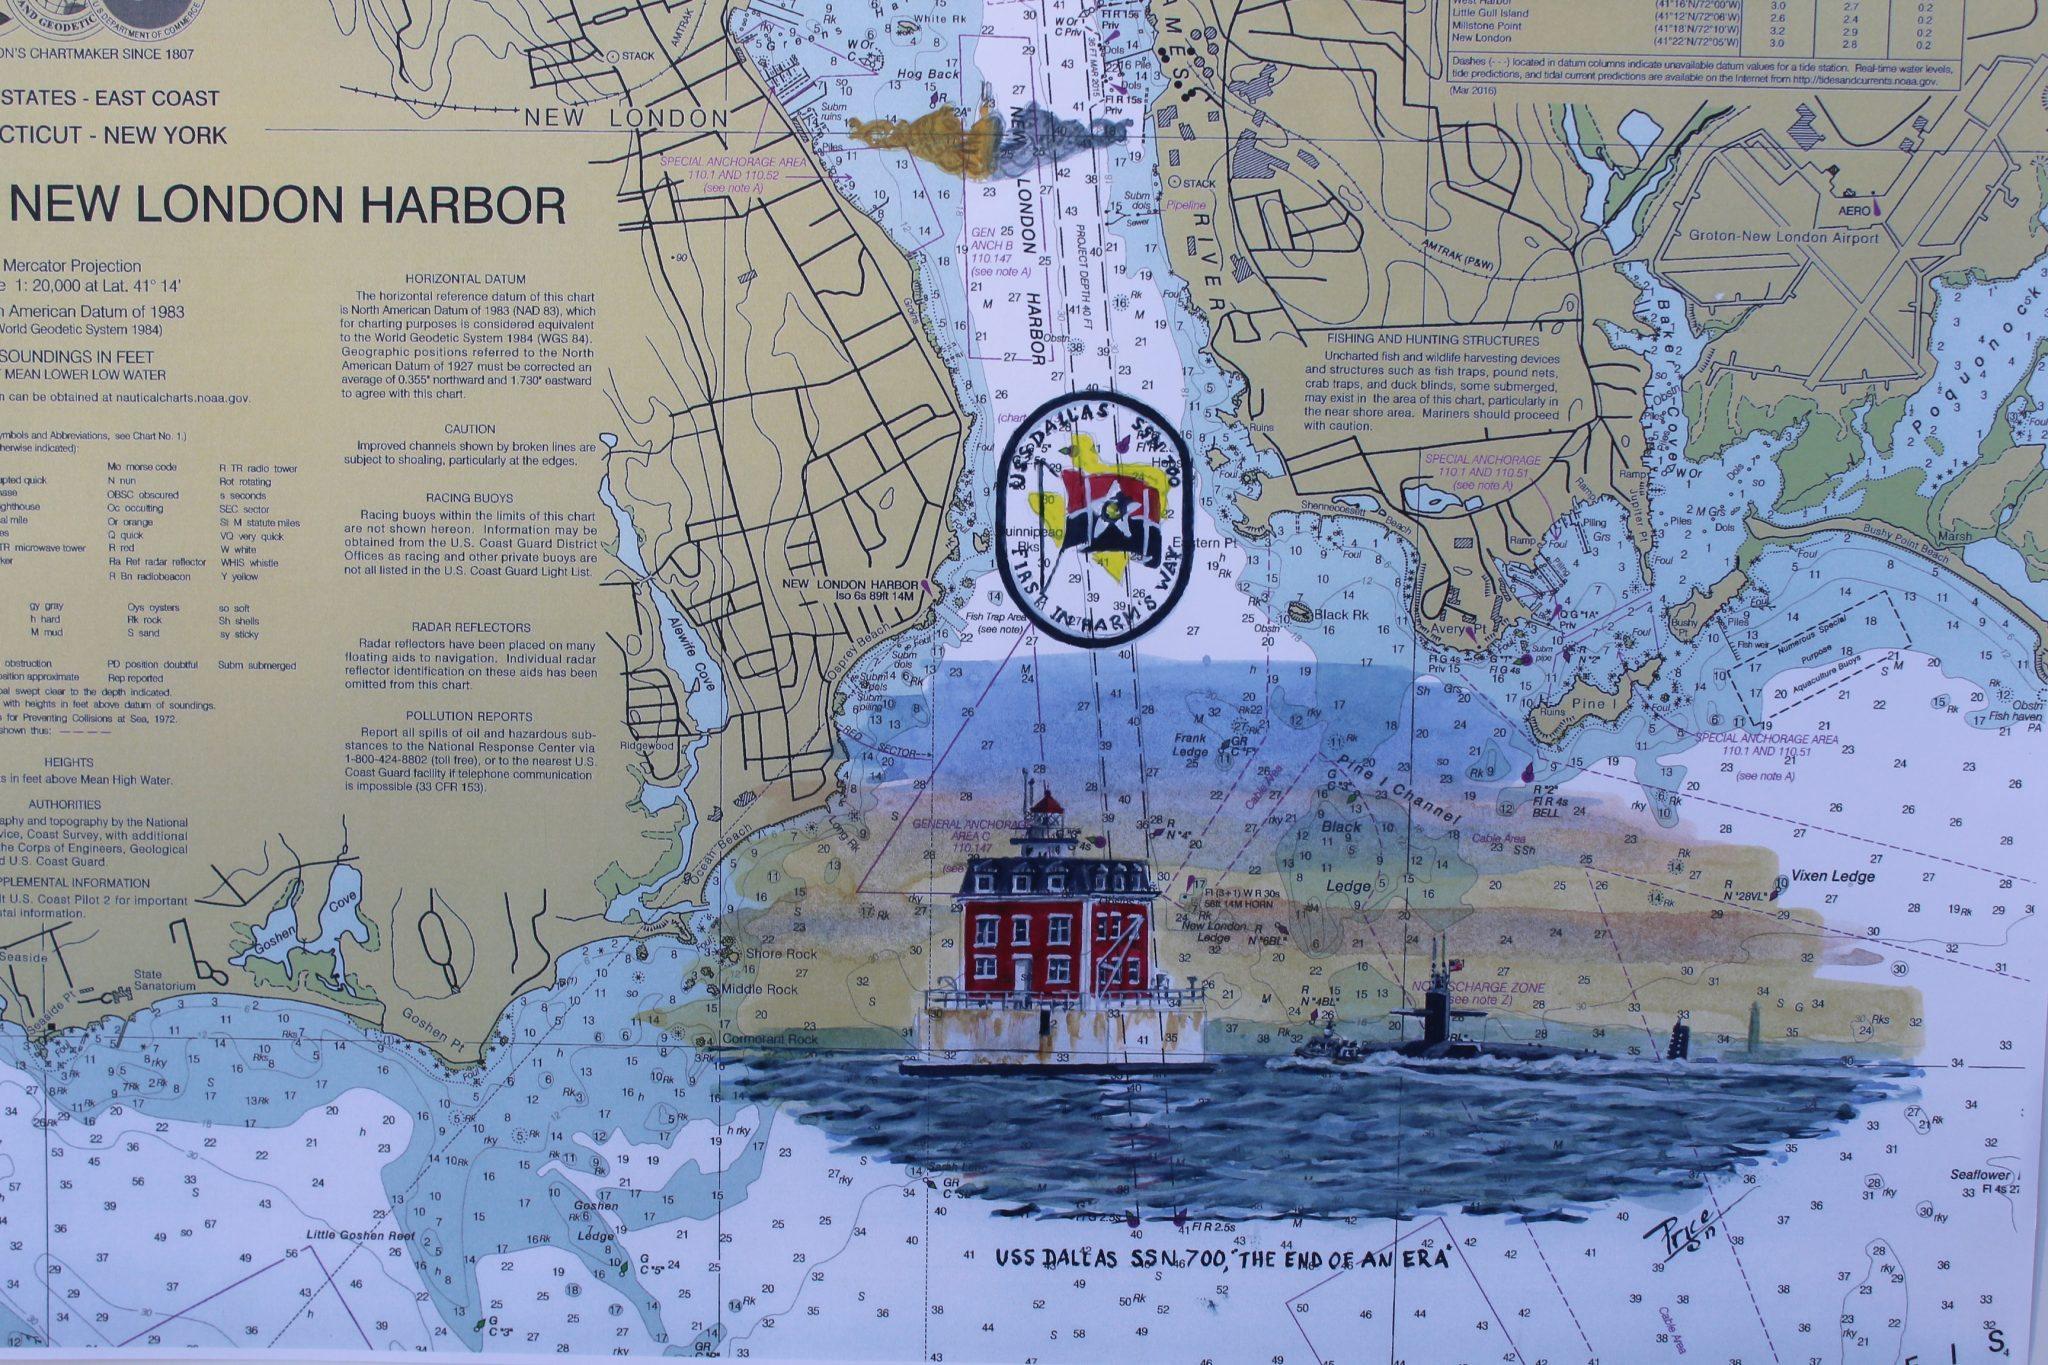 USS Dallas The End of an Era Chart by Artwork Daniel Price